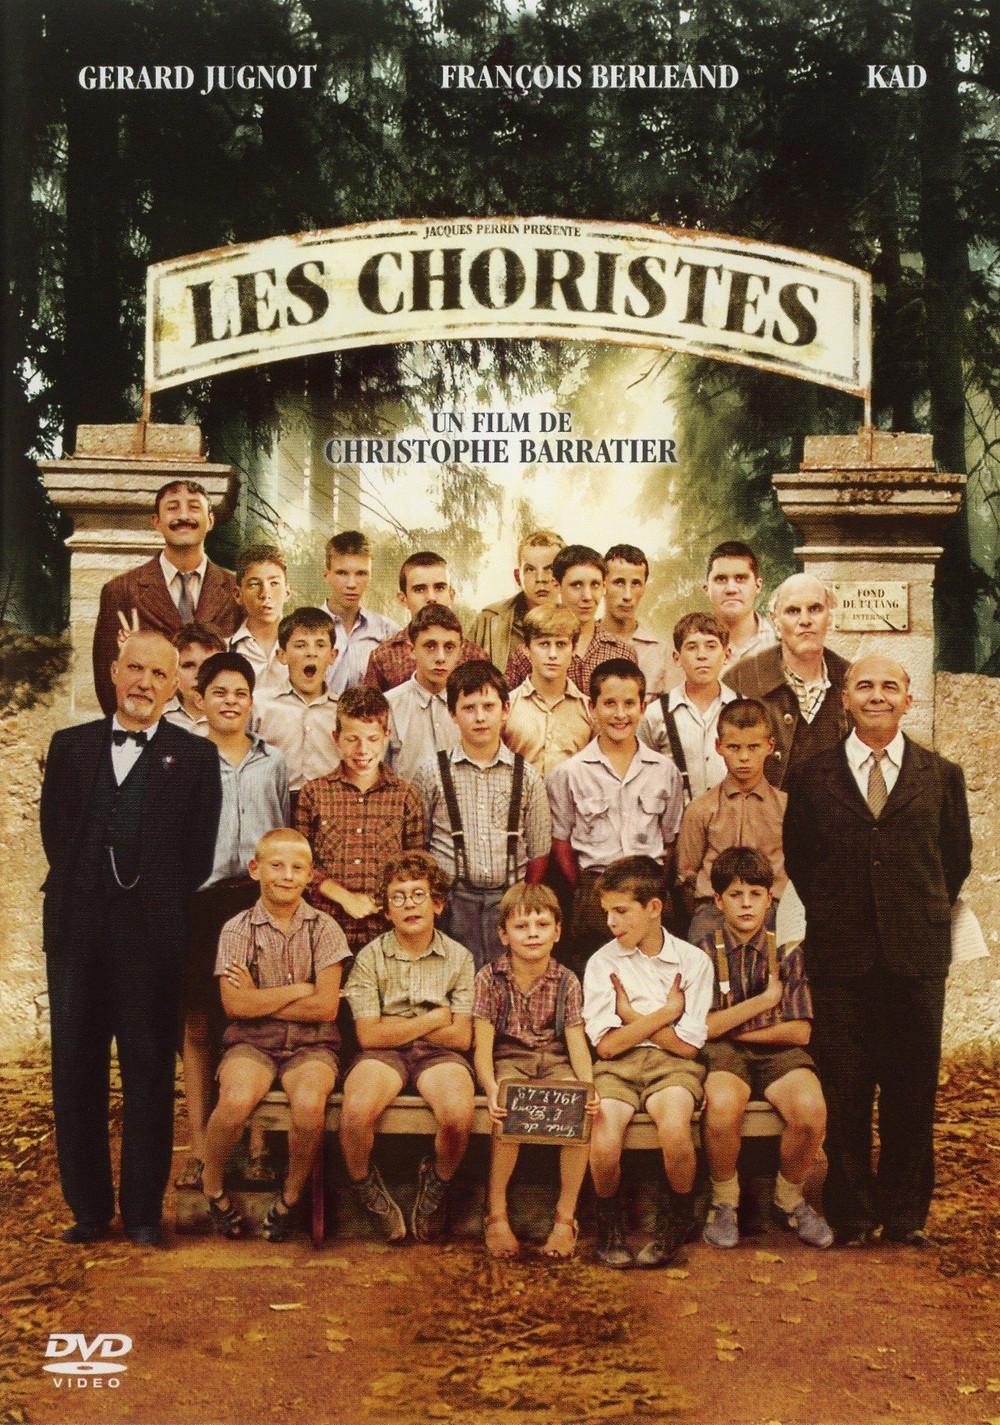 Les Choristes כשהנערים שרים